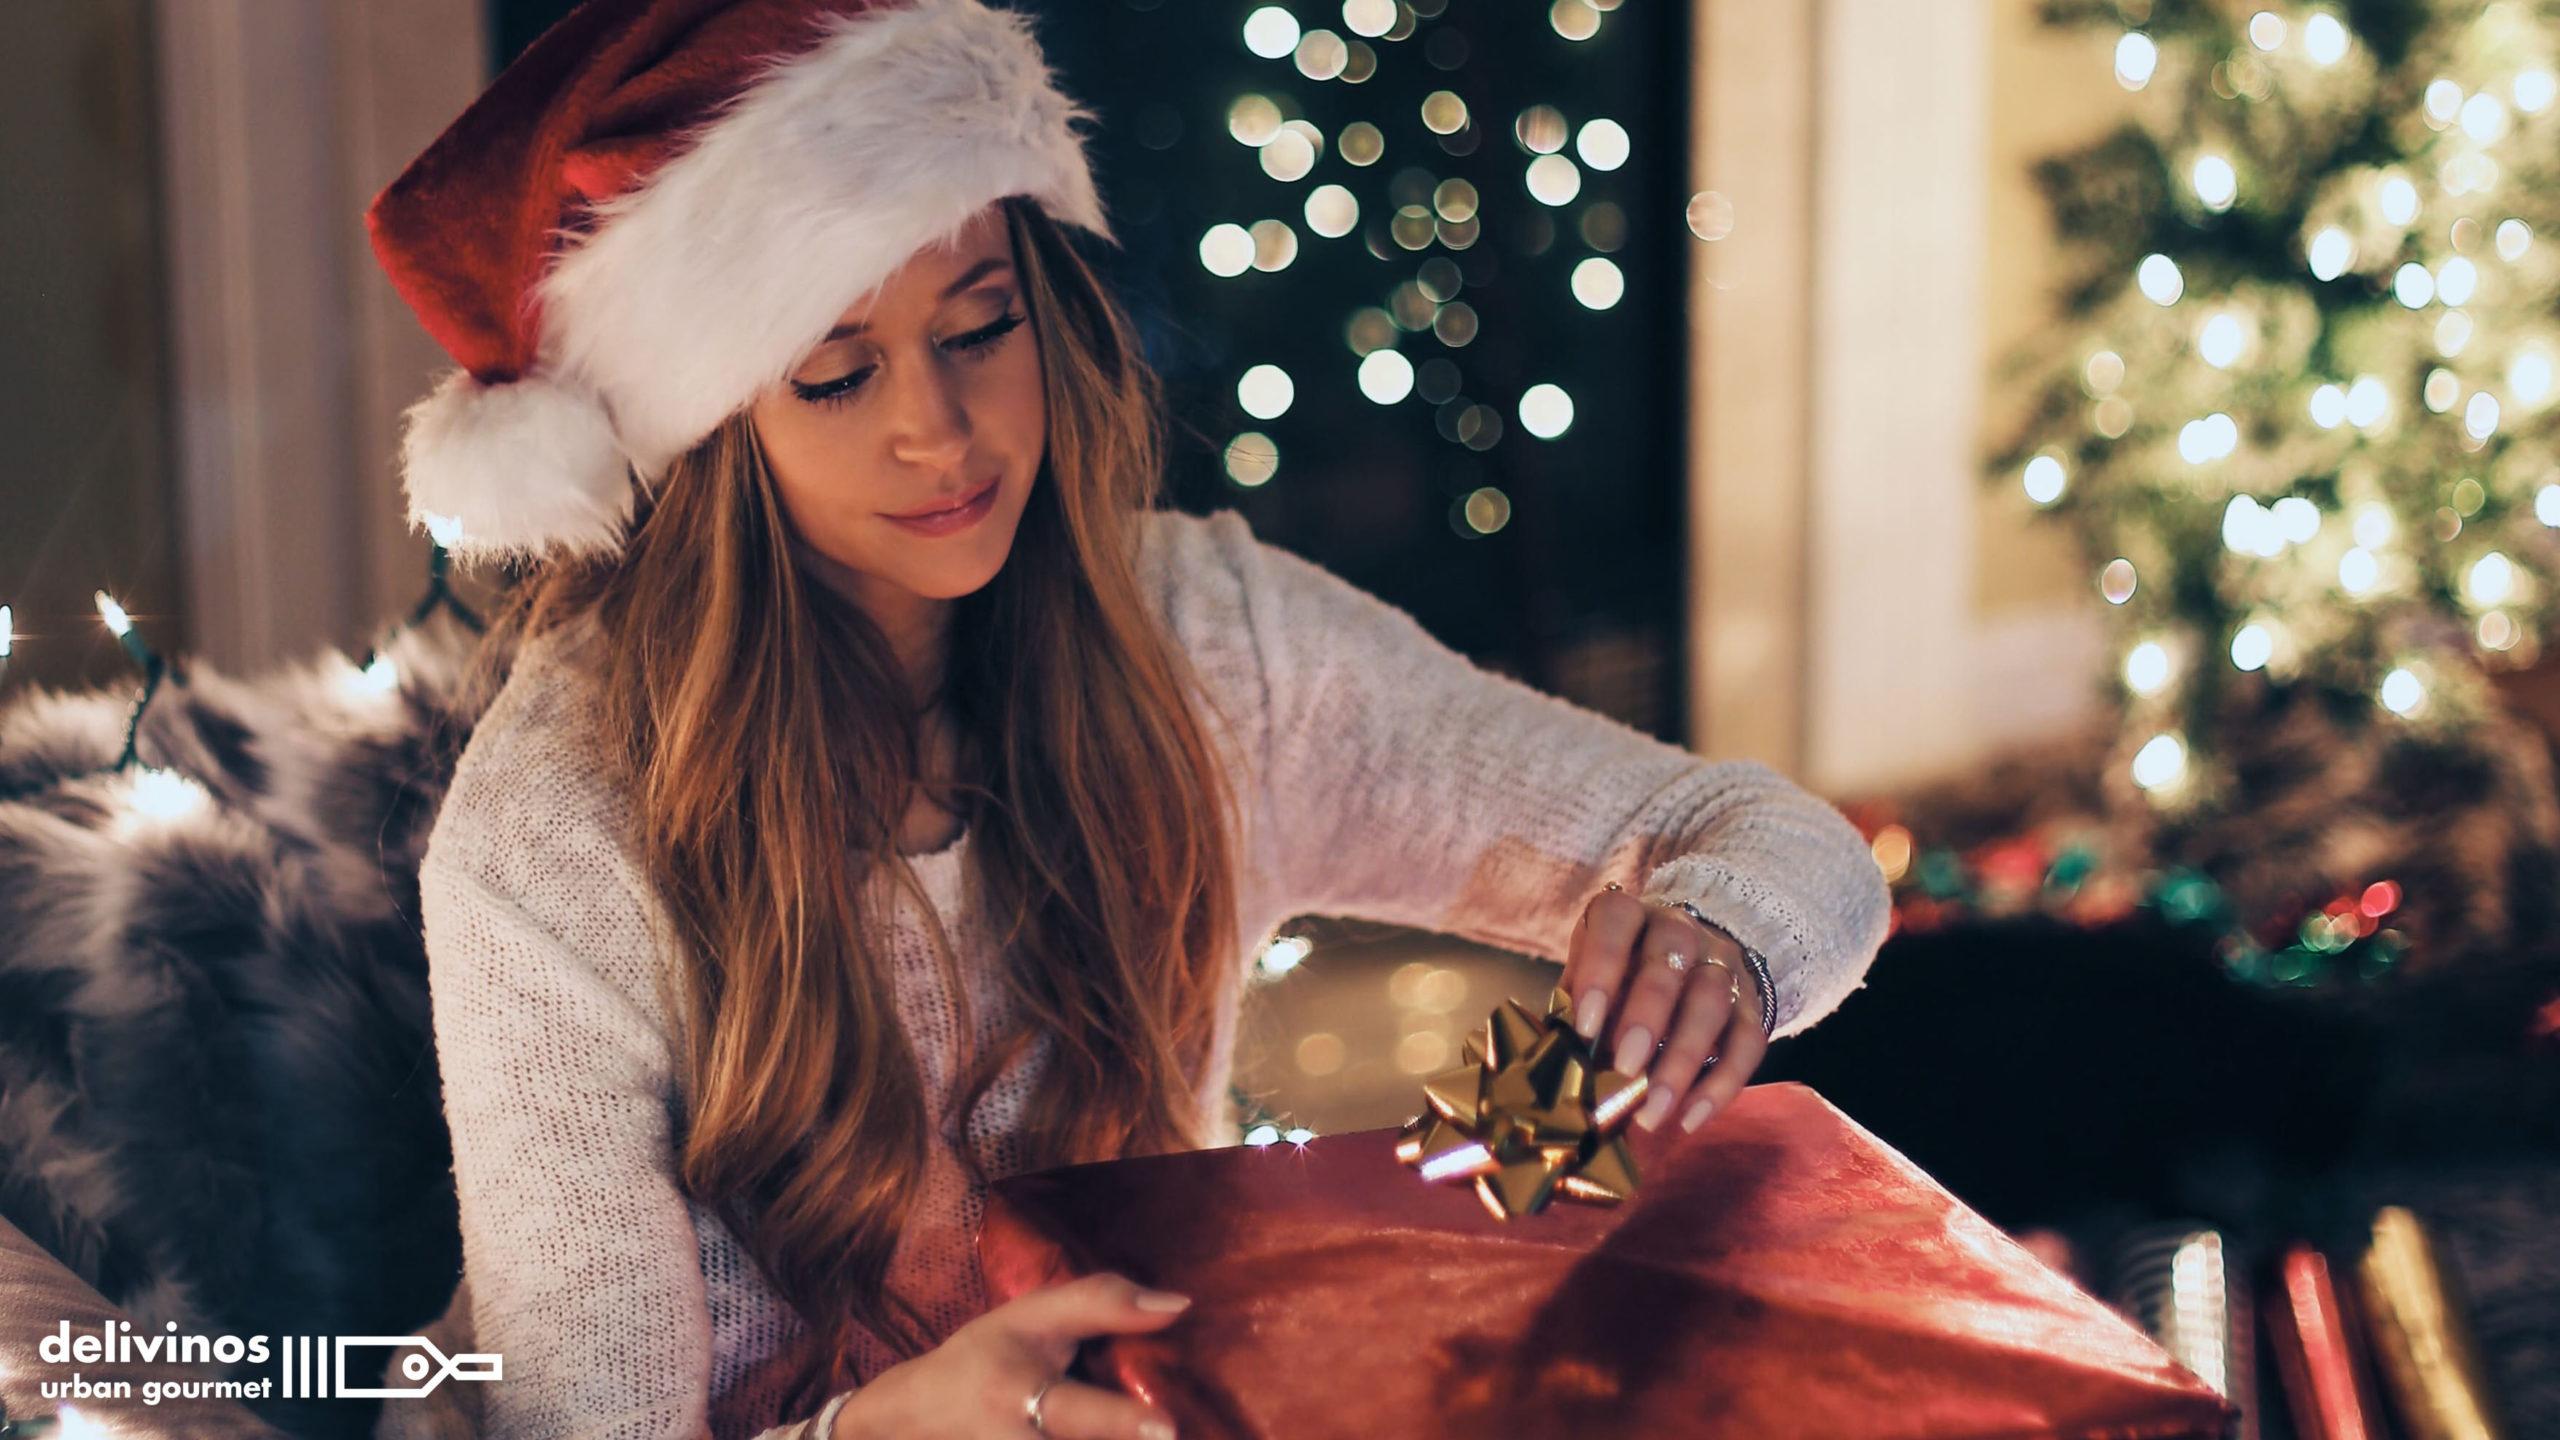 Productos indispensables que toda cesta navideña debe incluir